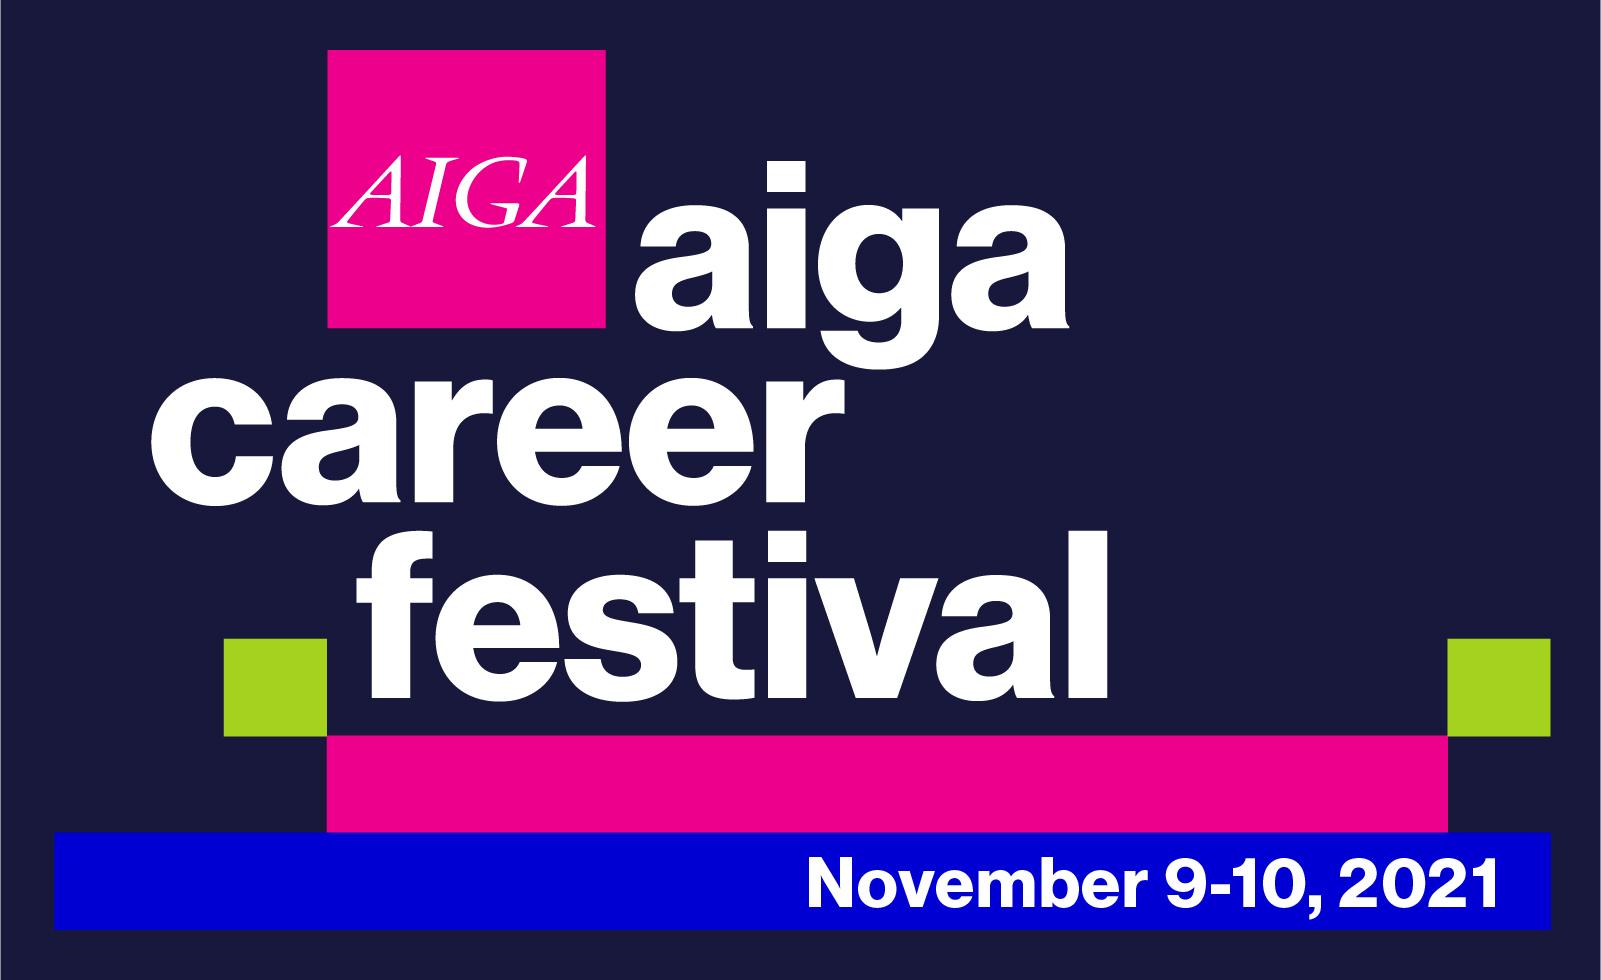 AIGA career festival November 9-10, 2021